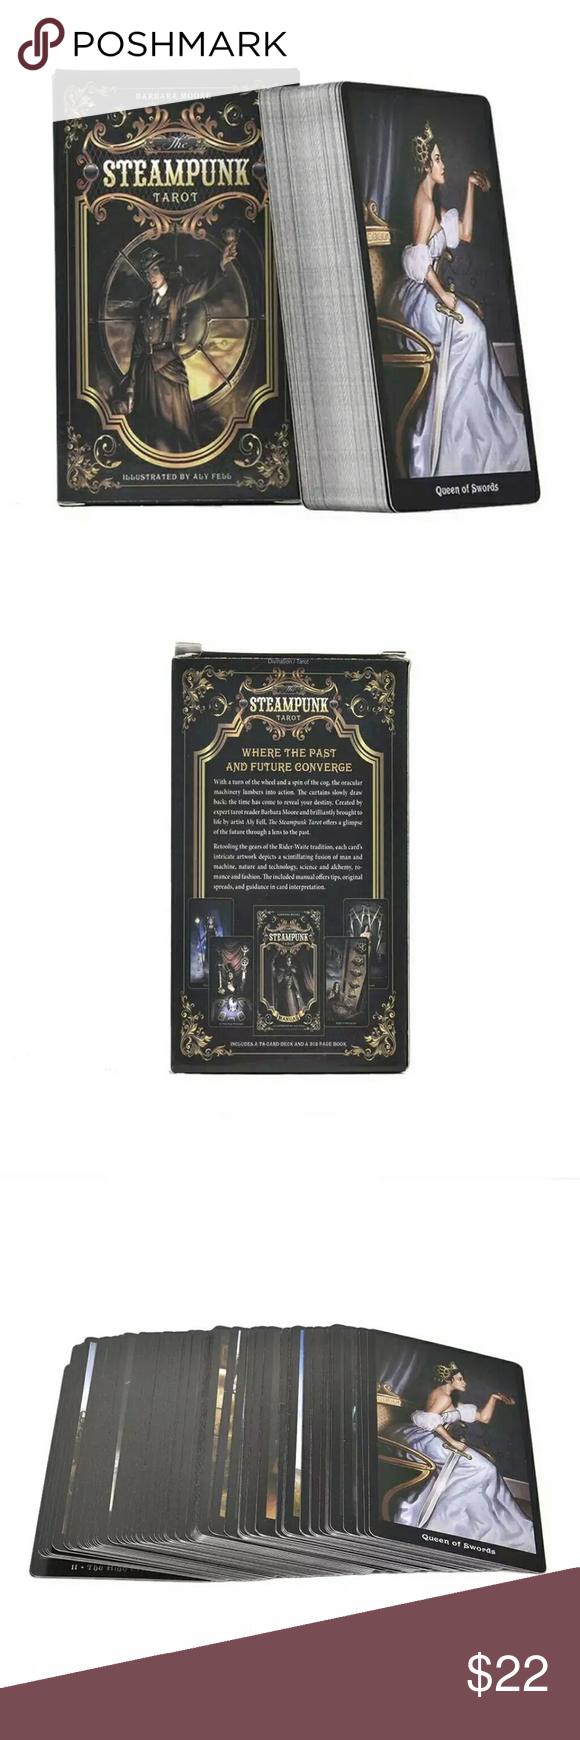 The Steampunk Tarot A 78 Card Deck The Steampunk Tarot deck offers a glimpse of the future through